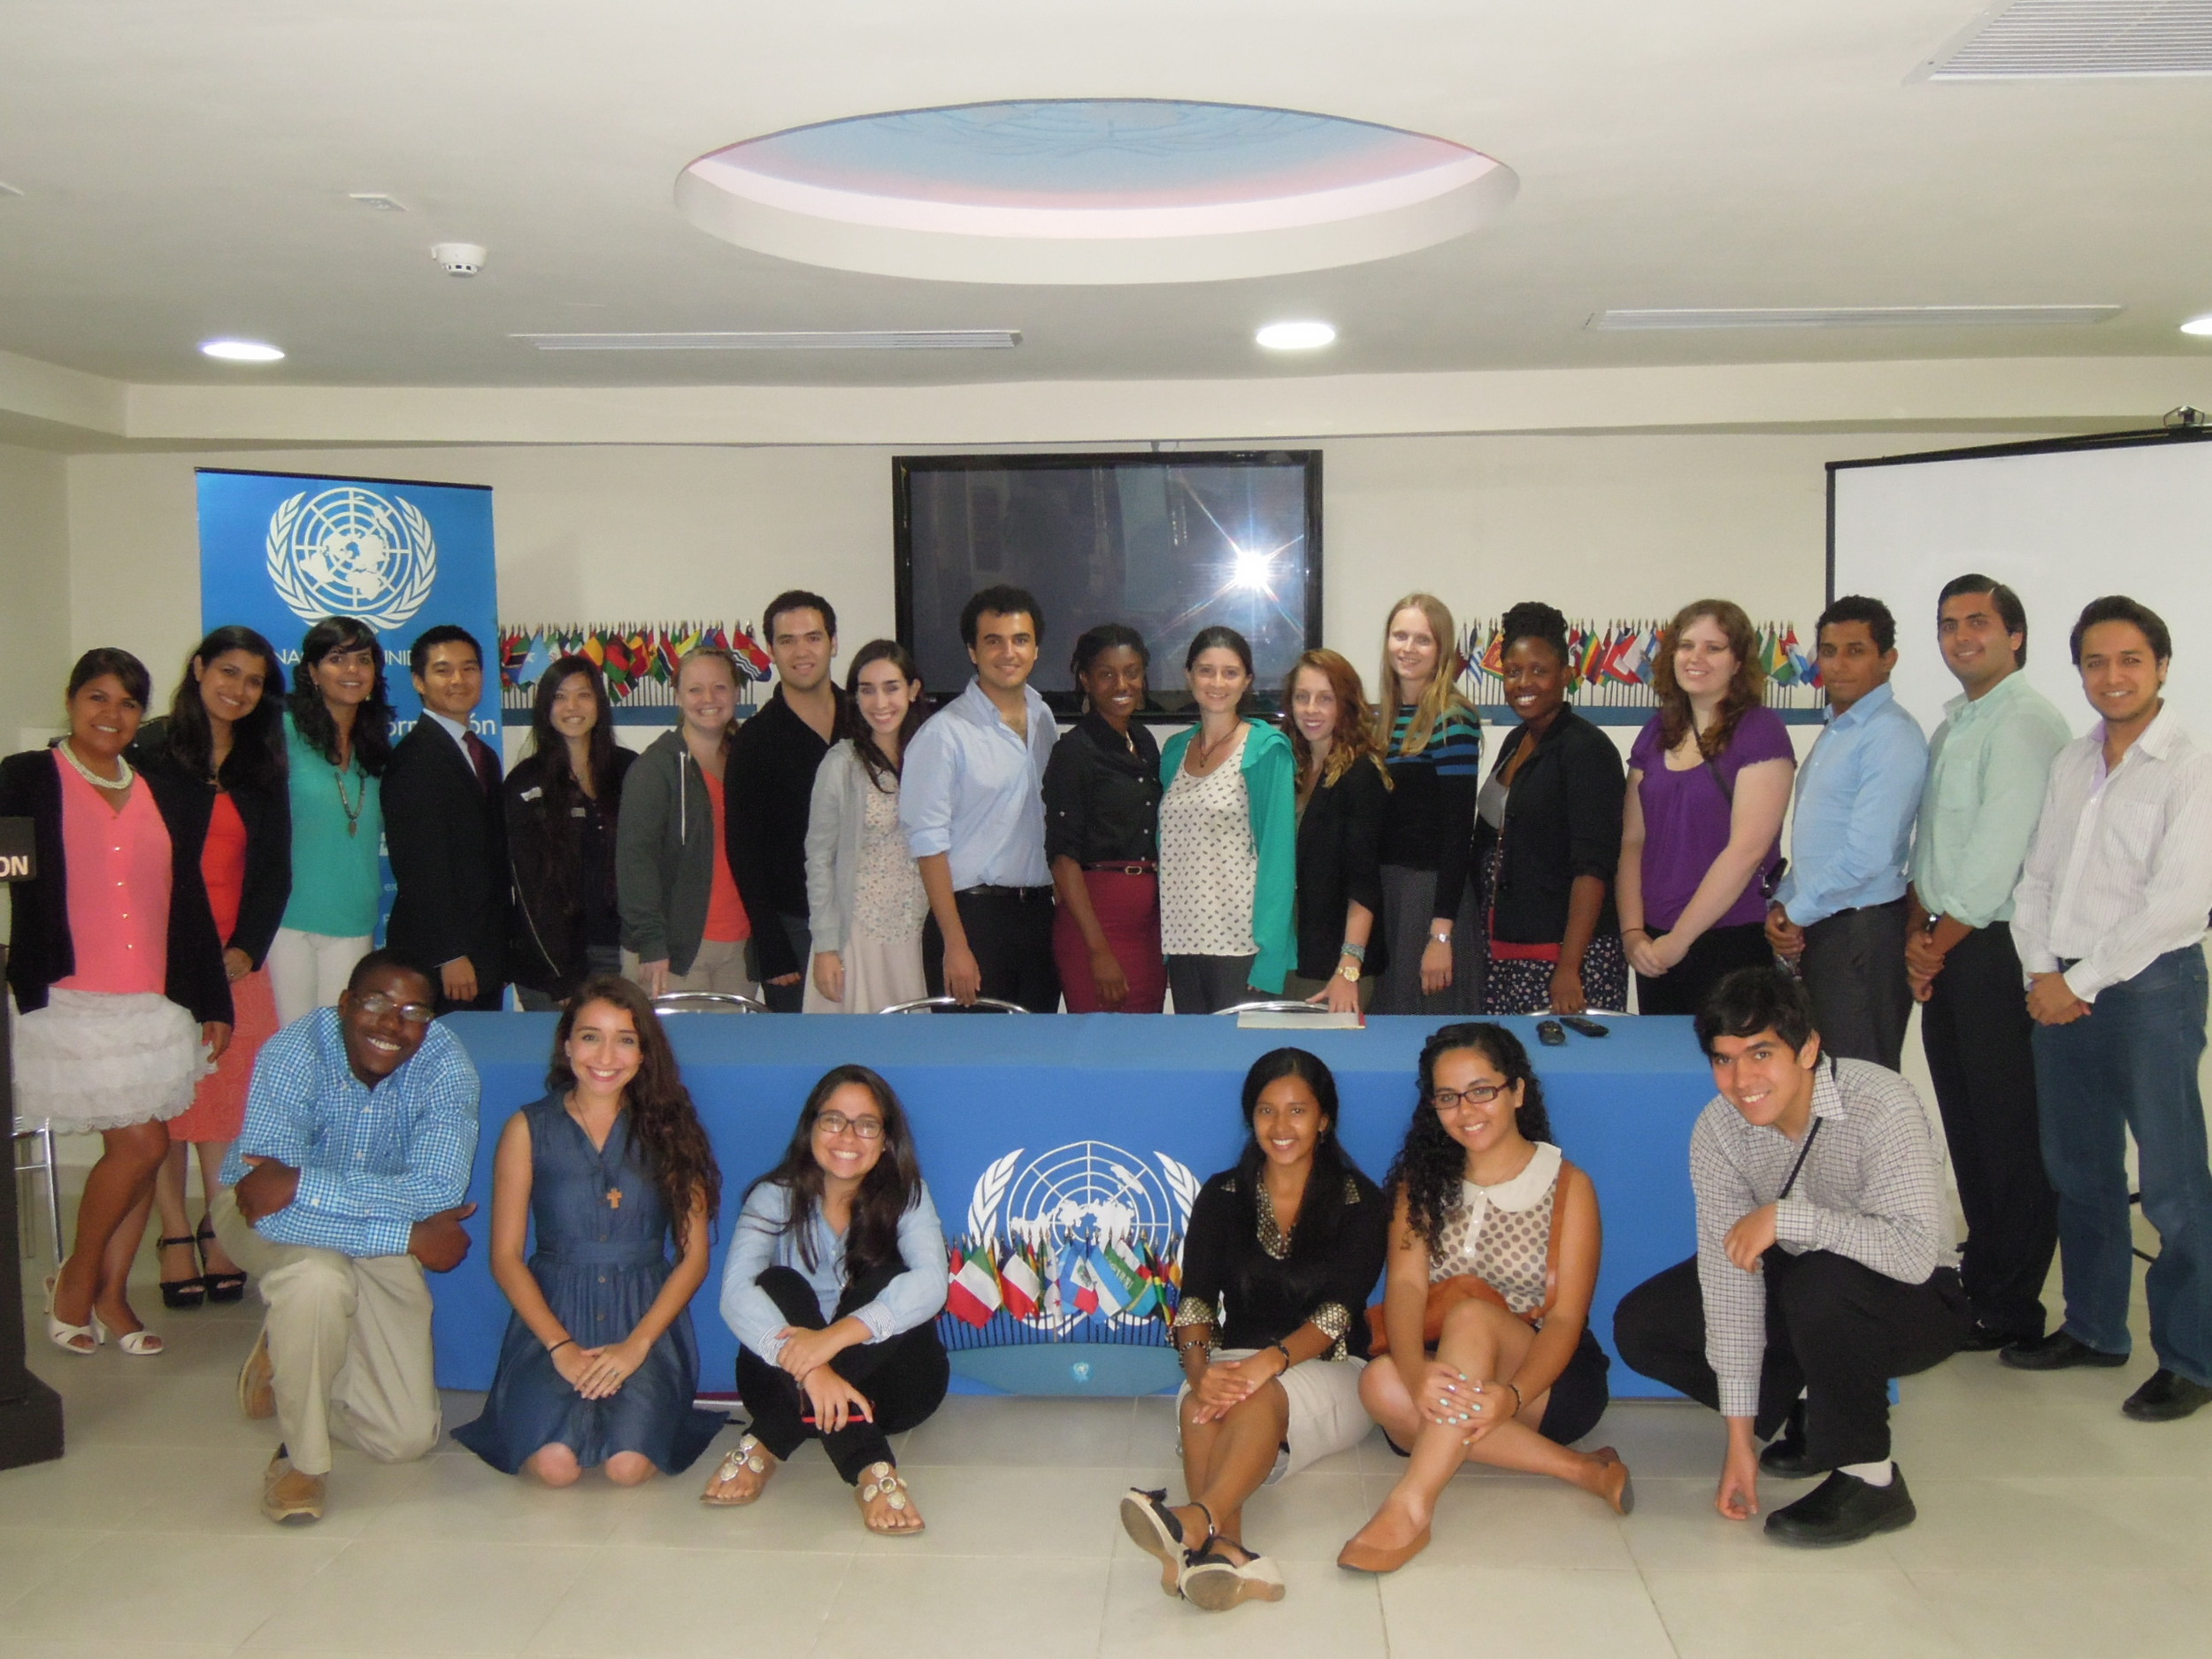 Global Leadership Program Panamá